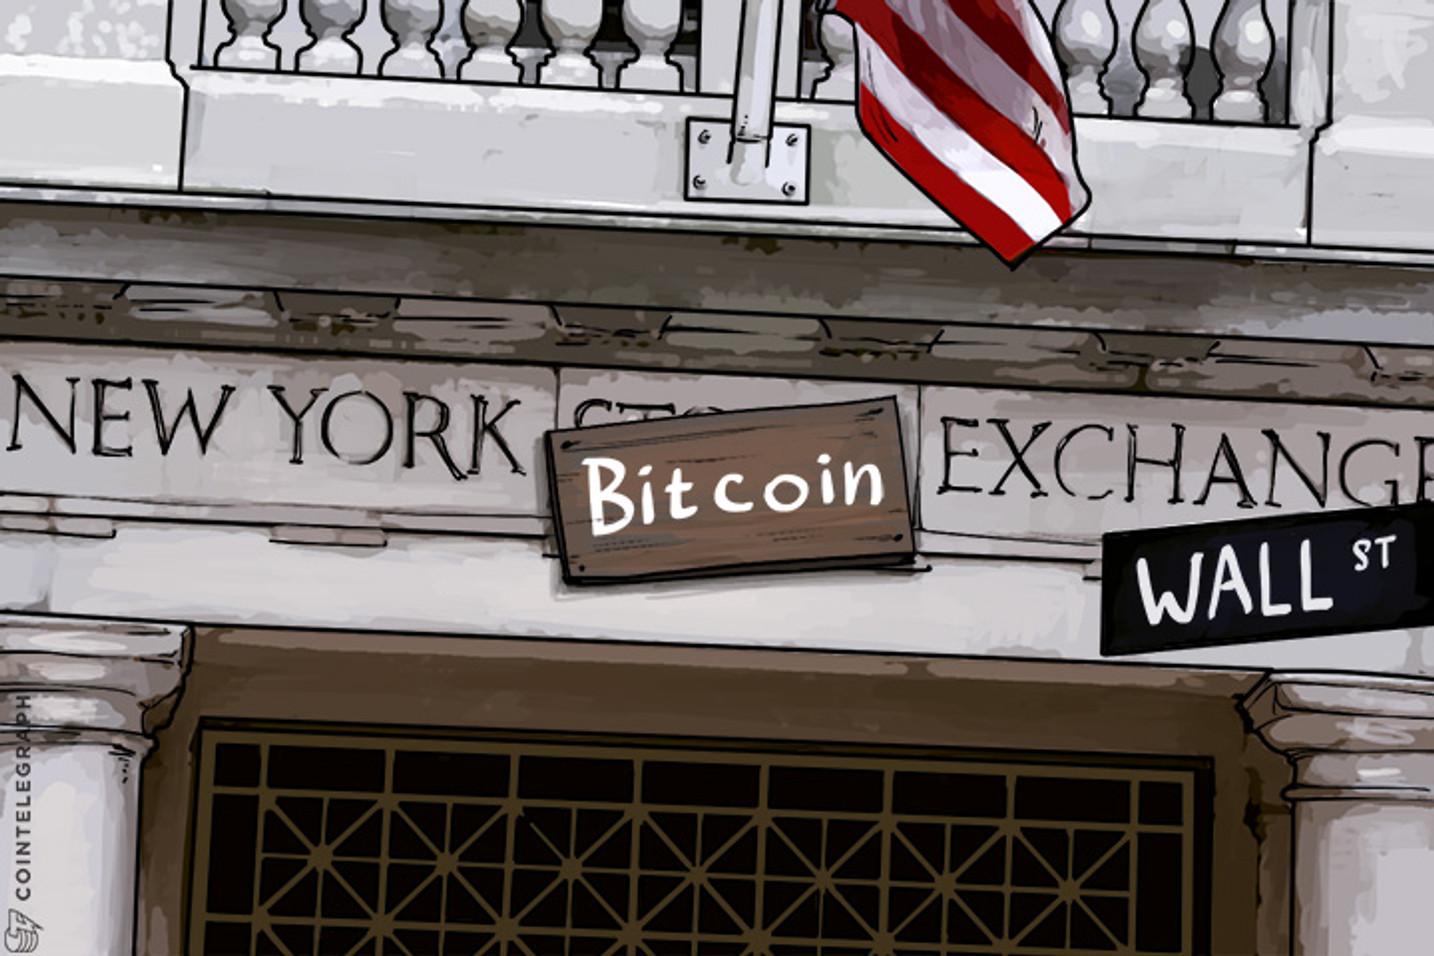 Wall Street Can No Longer Dismiss Bitcoin, Demand is Too High